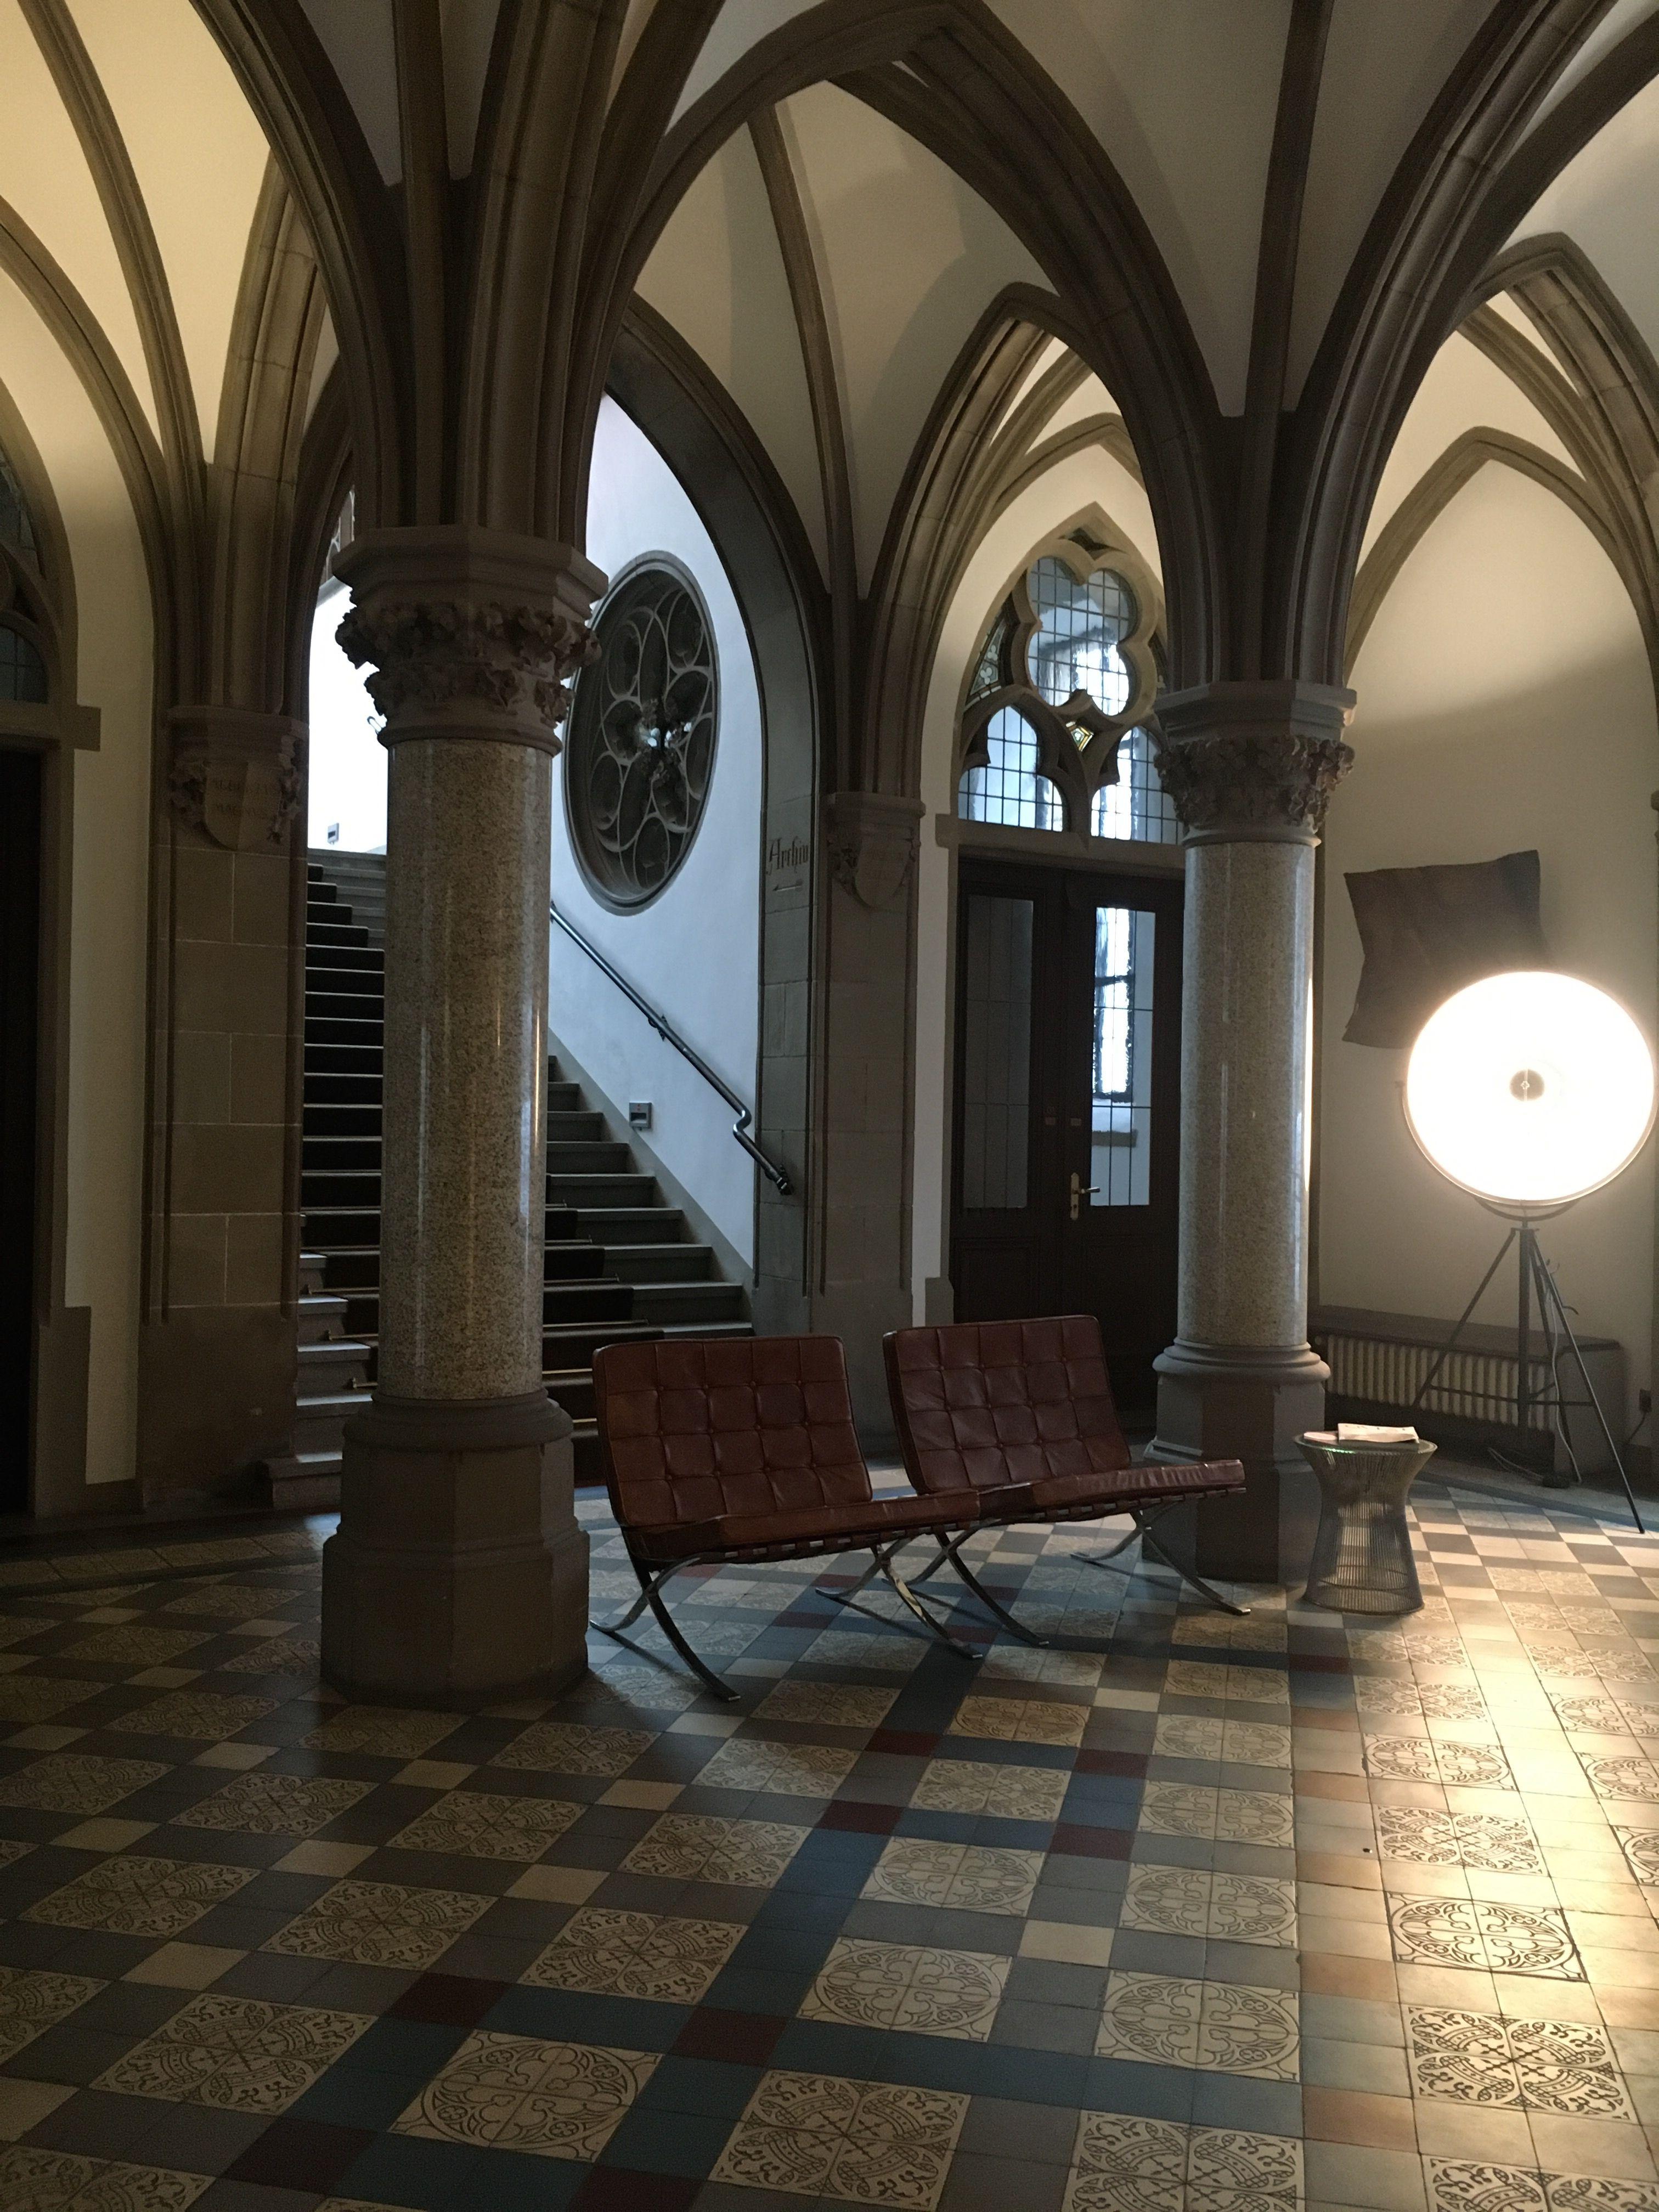 Luxury Showcase For Living Room Royal Art Deco: THE QVEST HOTEL At Köln